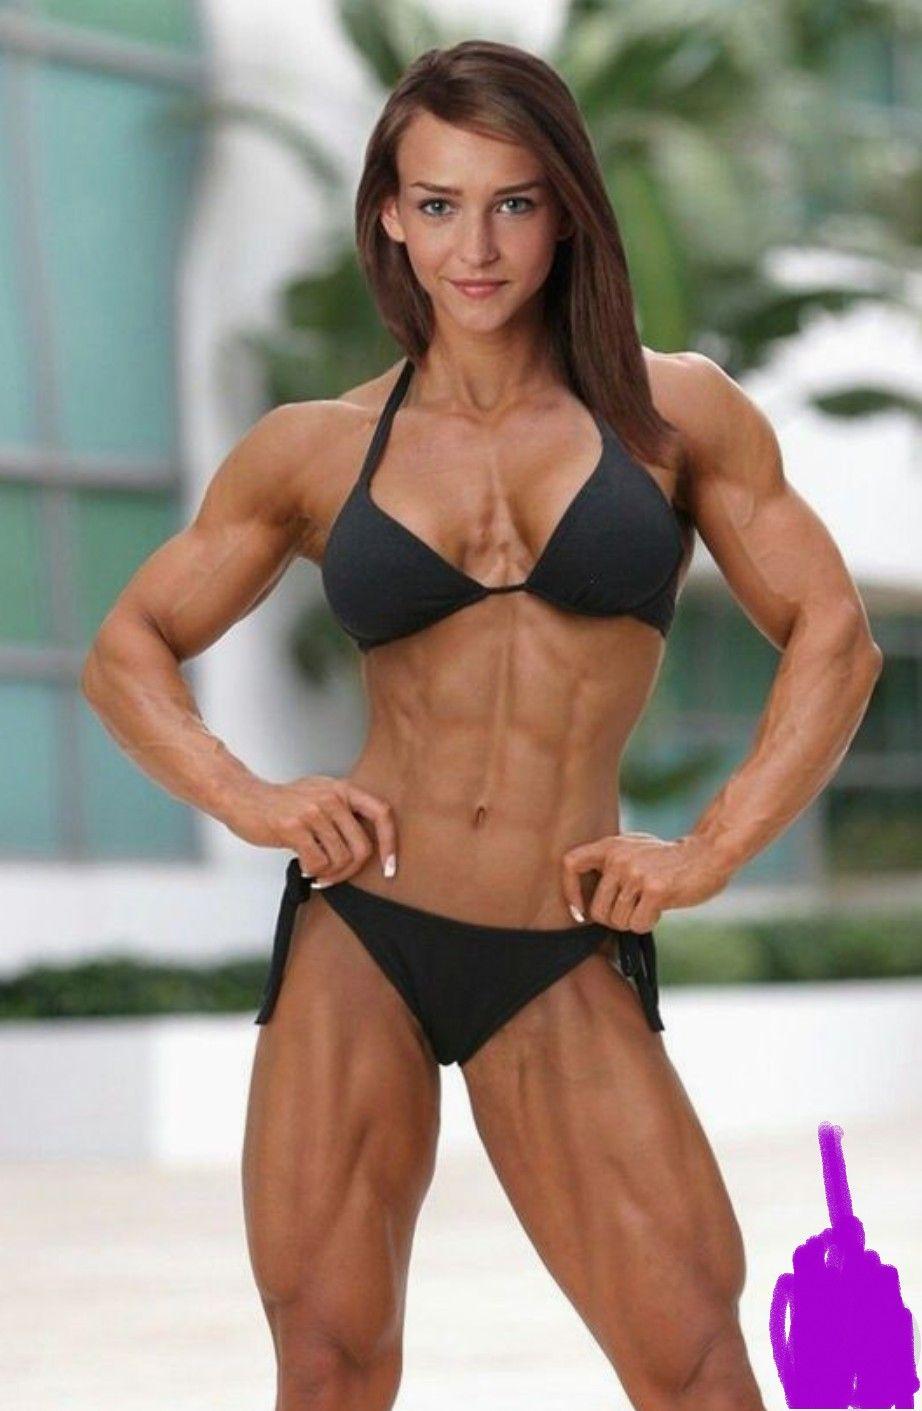 dieta+fitness+model+donne